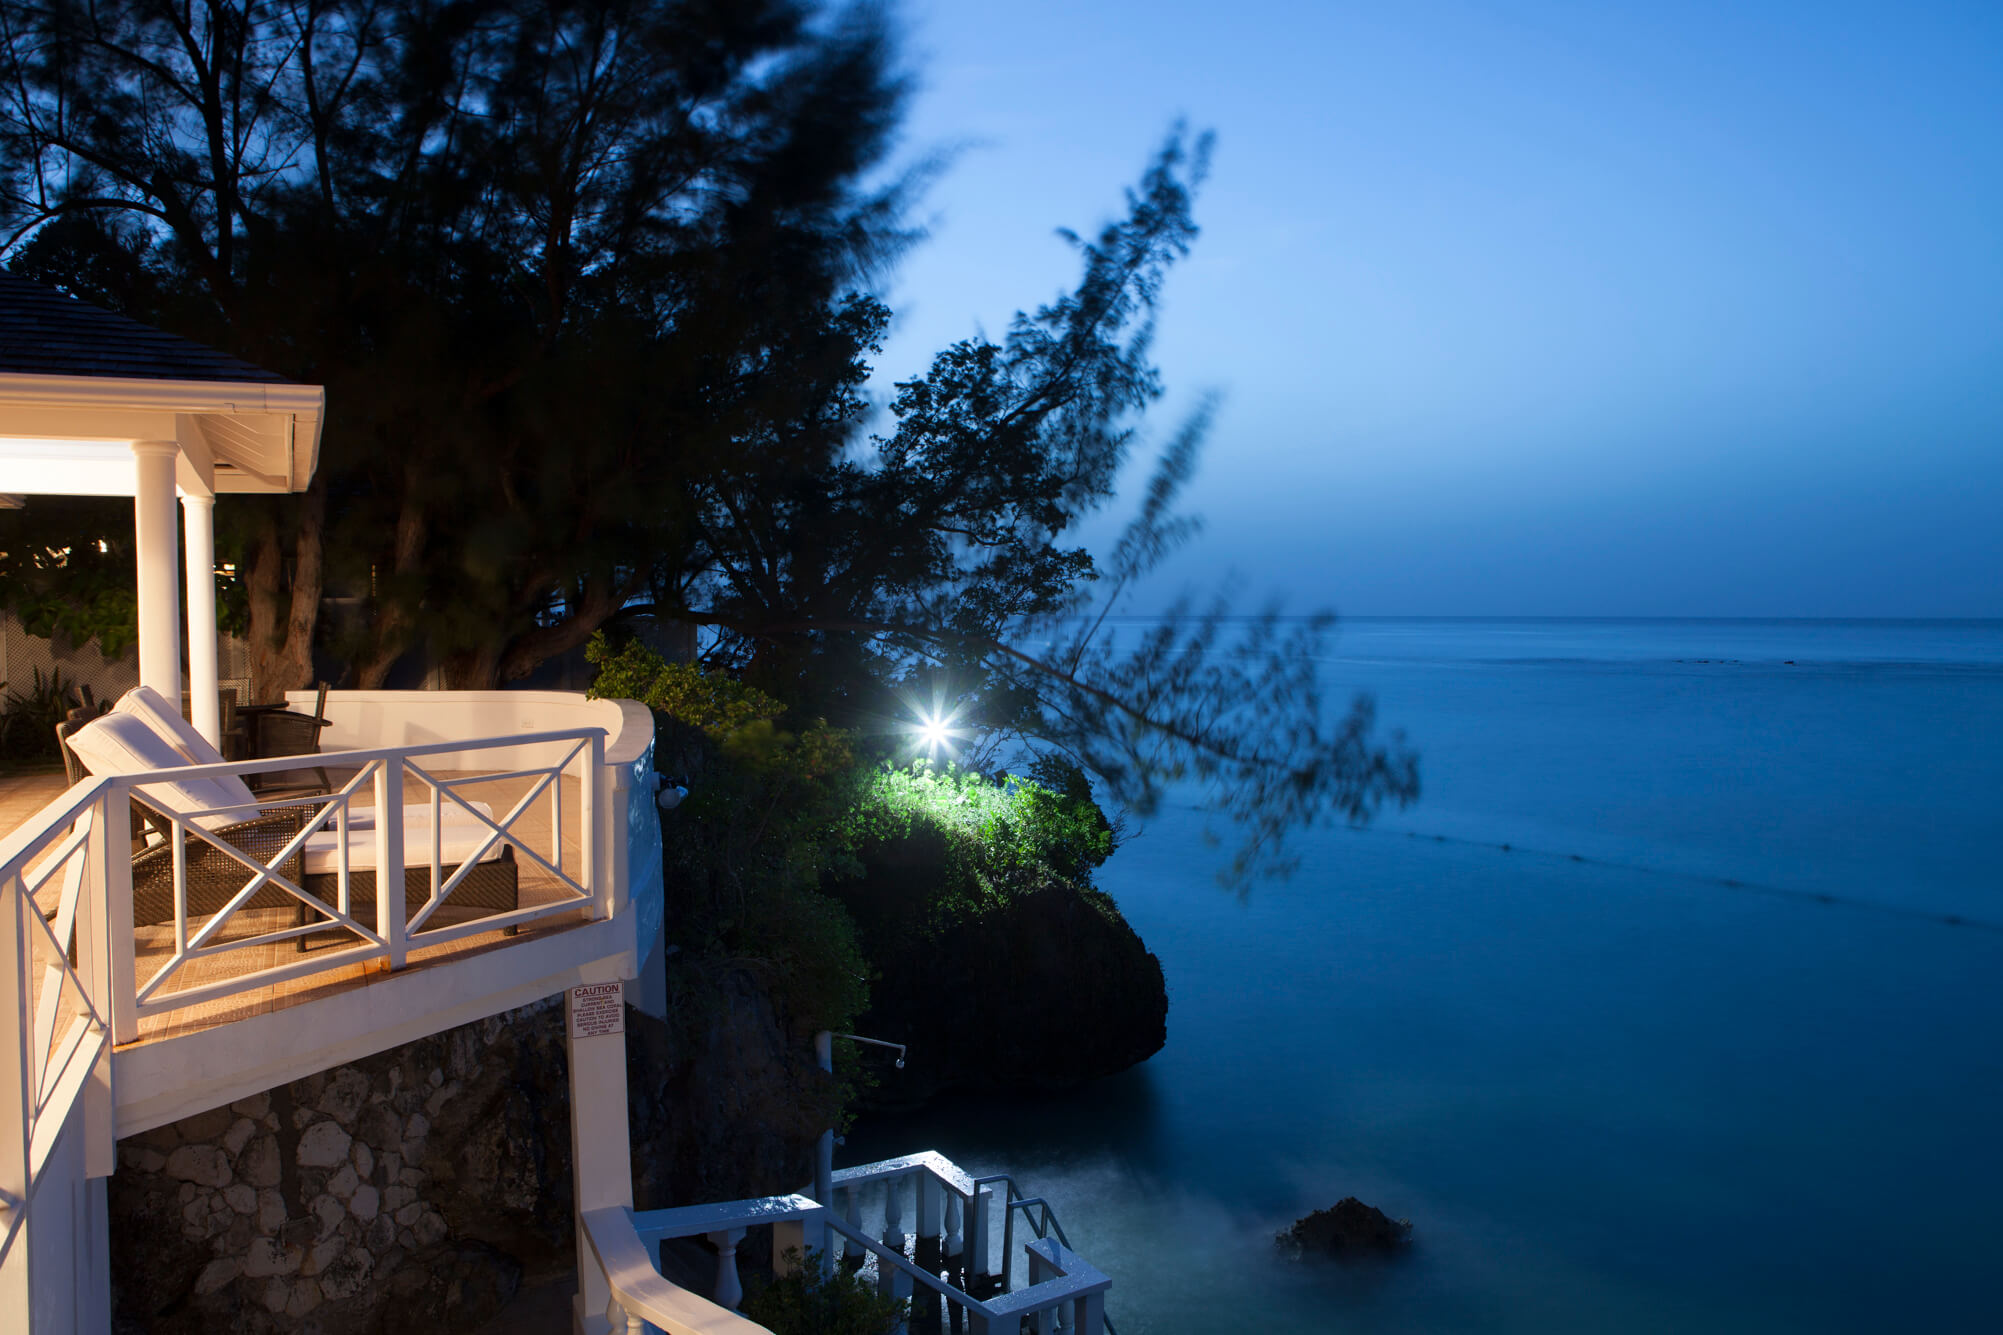 jamaica-inn-17.jpg